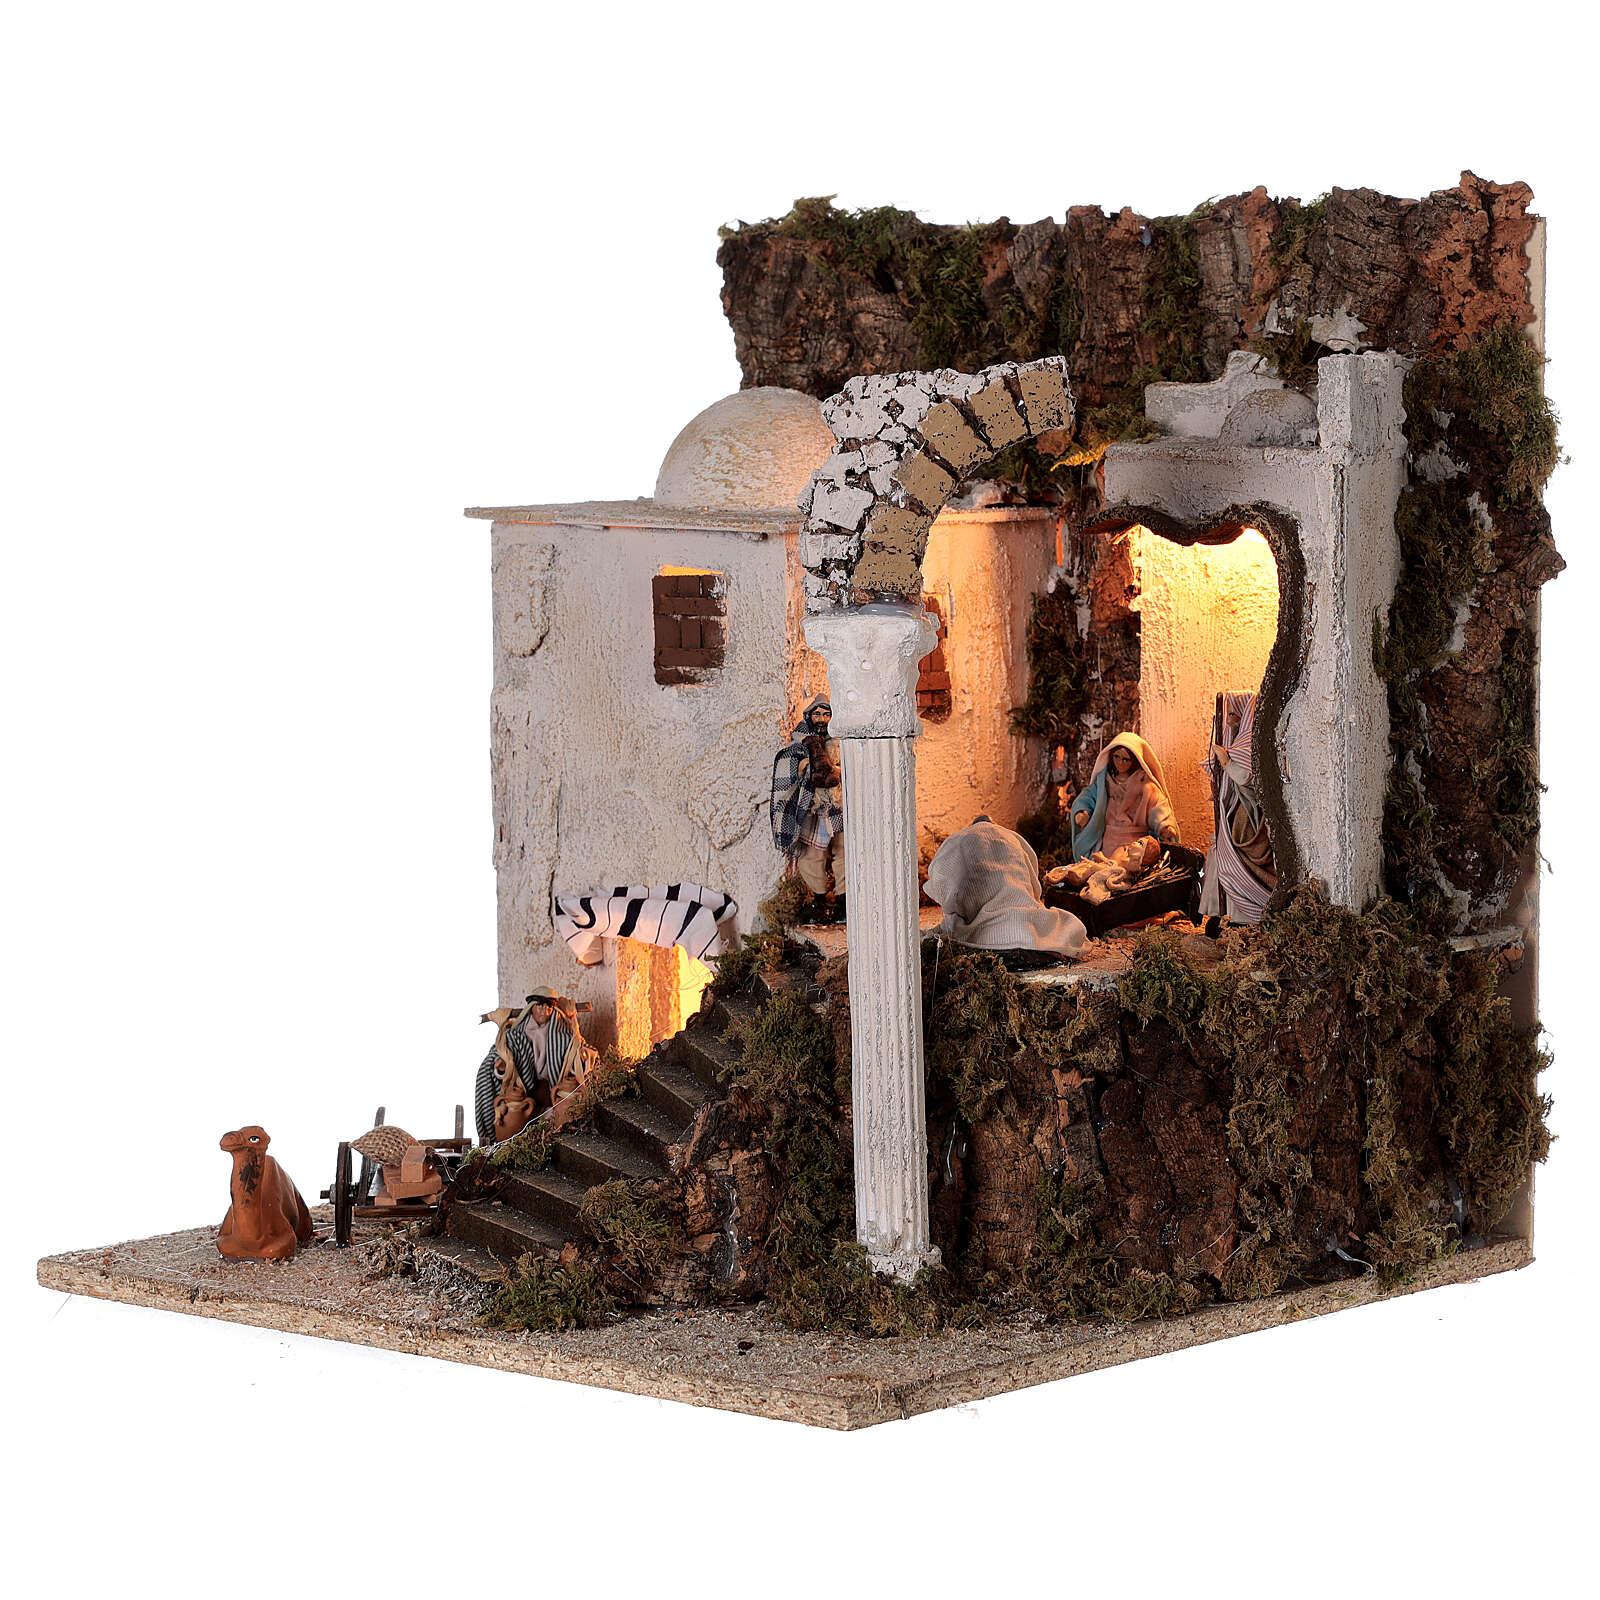 Borgo arabo (B) Natività pastori 8 cm illuminato presepe napoletano 40x35x35 cm 4